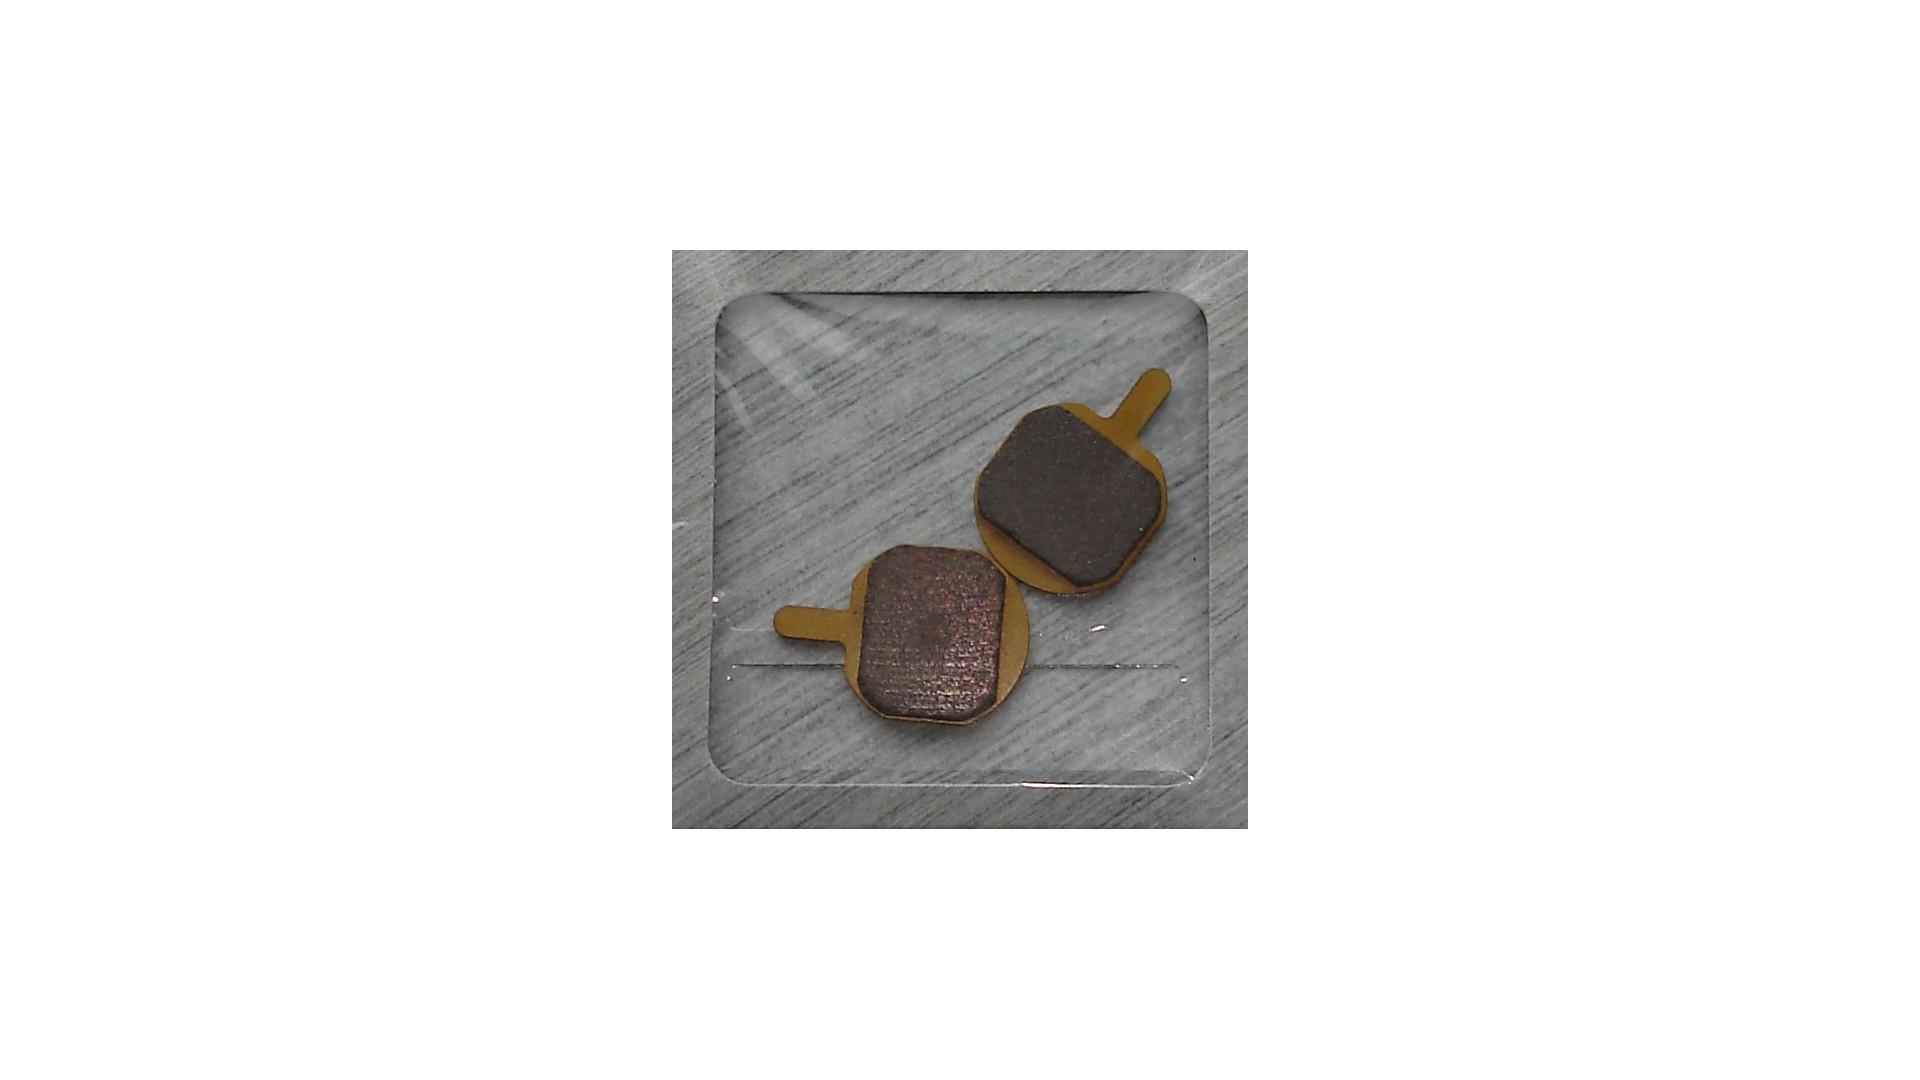 Тормозные колодки Quaxar Hayes Sole/MX1/MX2 для дискового тормоза